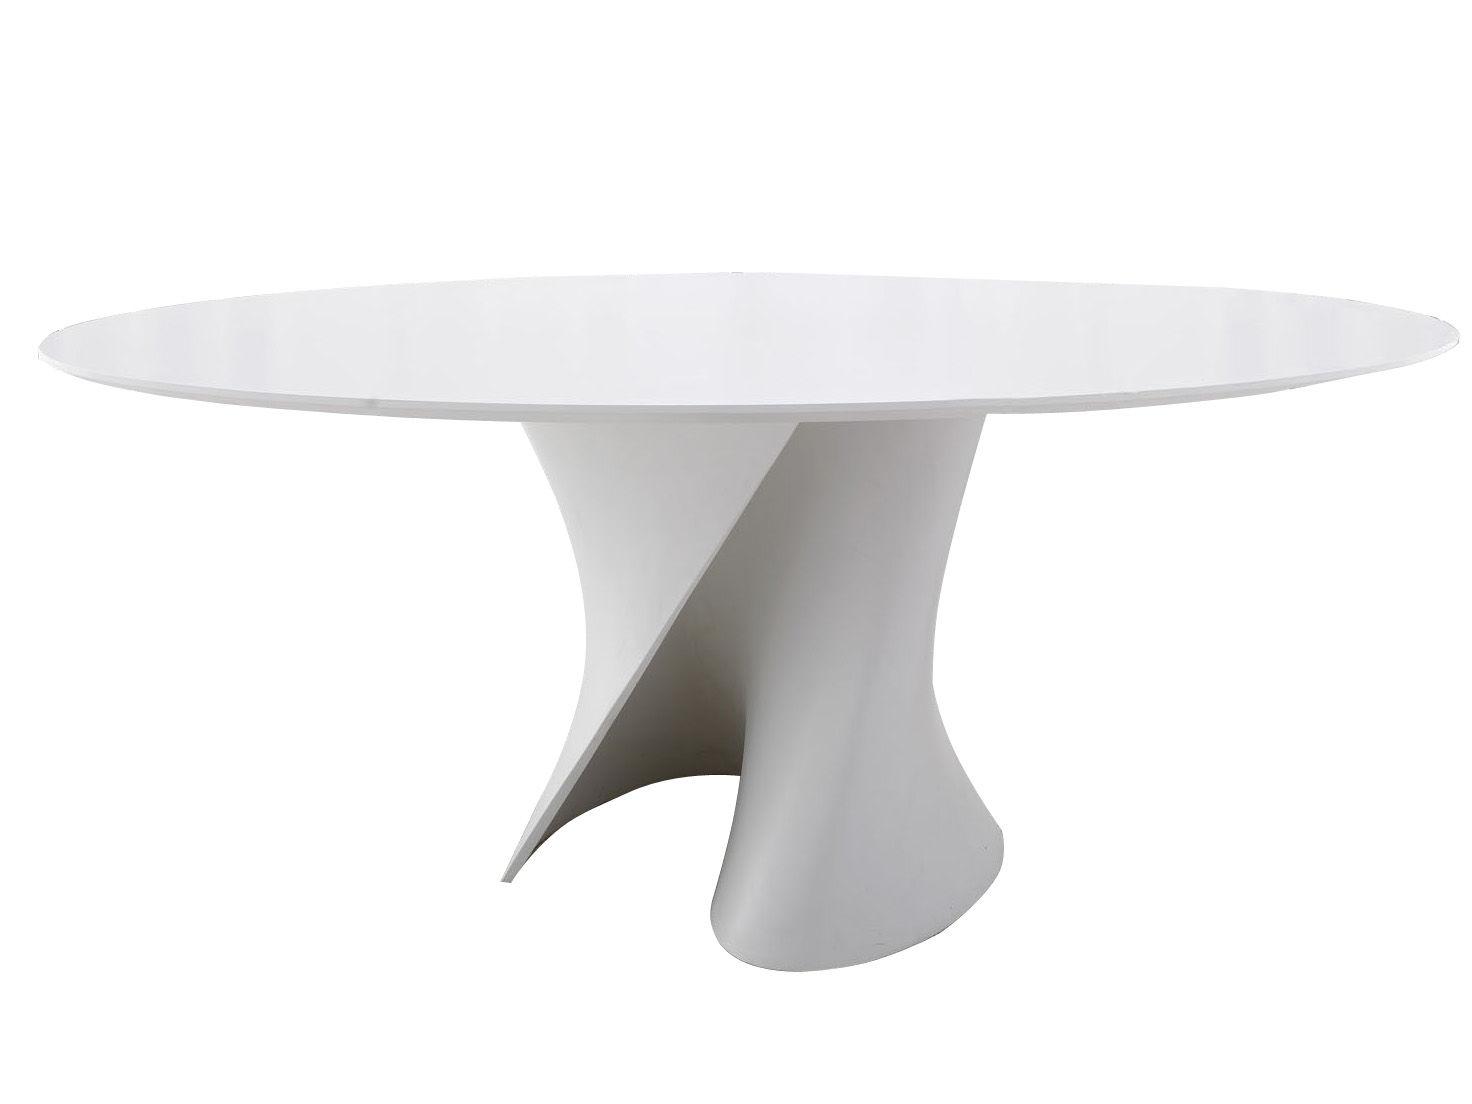 Mobilier - Tables - Table ovale S /150 x 210 cm - Plateau cristalplant - MDF Italia - Blanc - Cristalplant